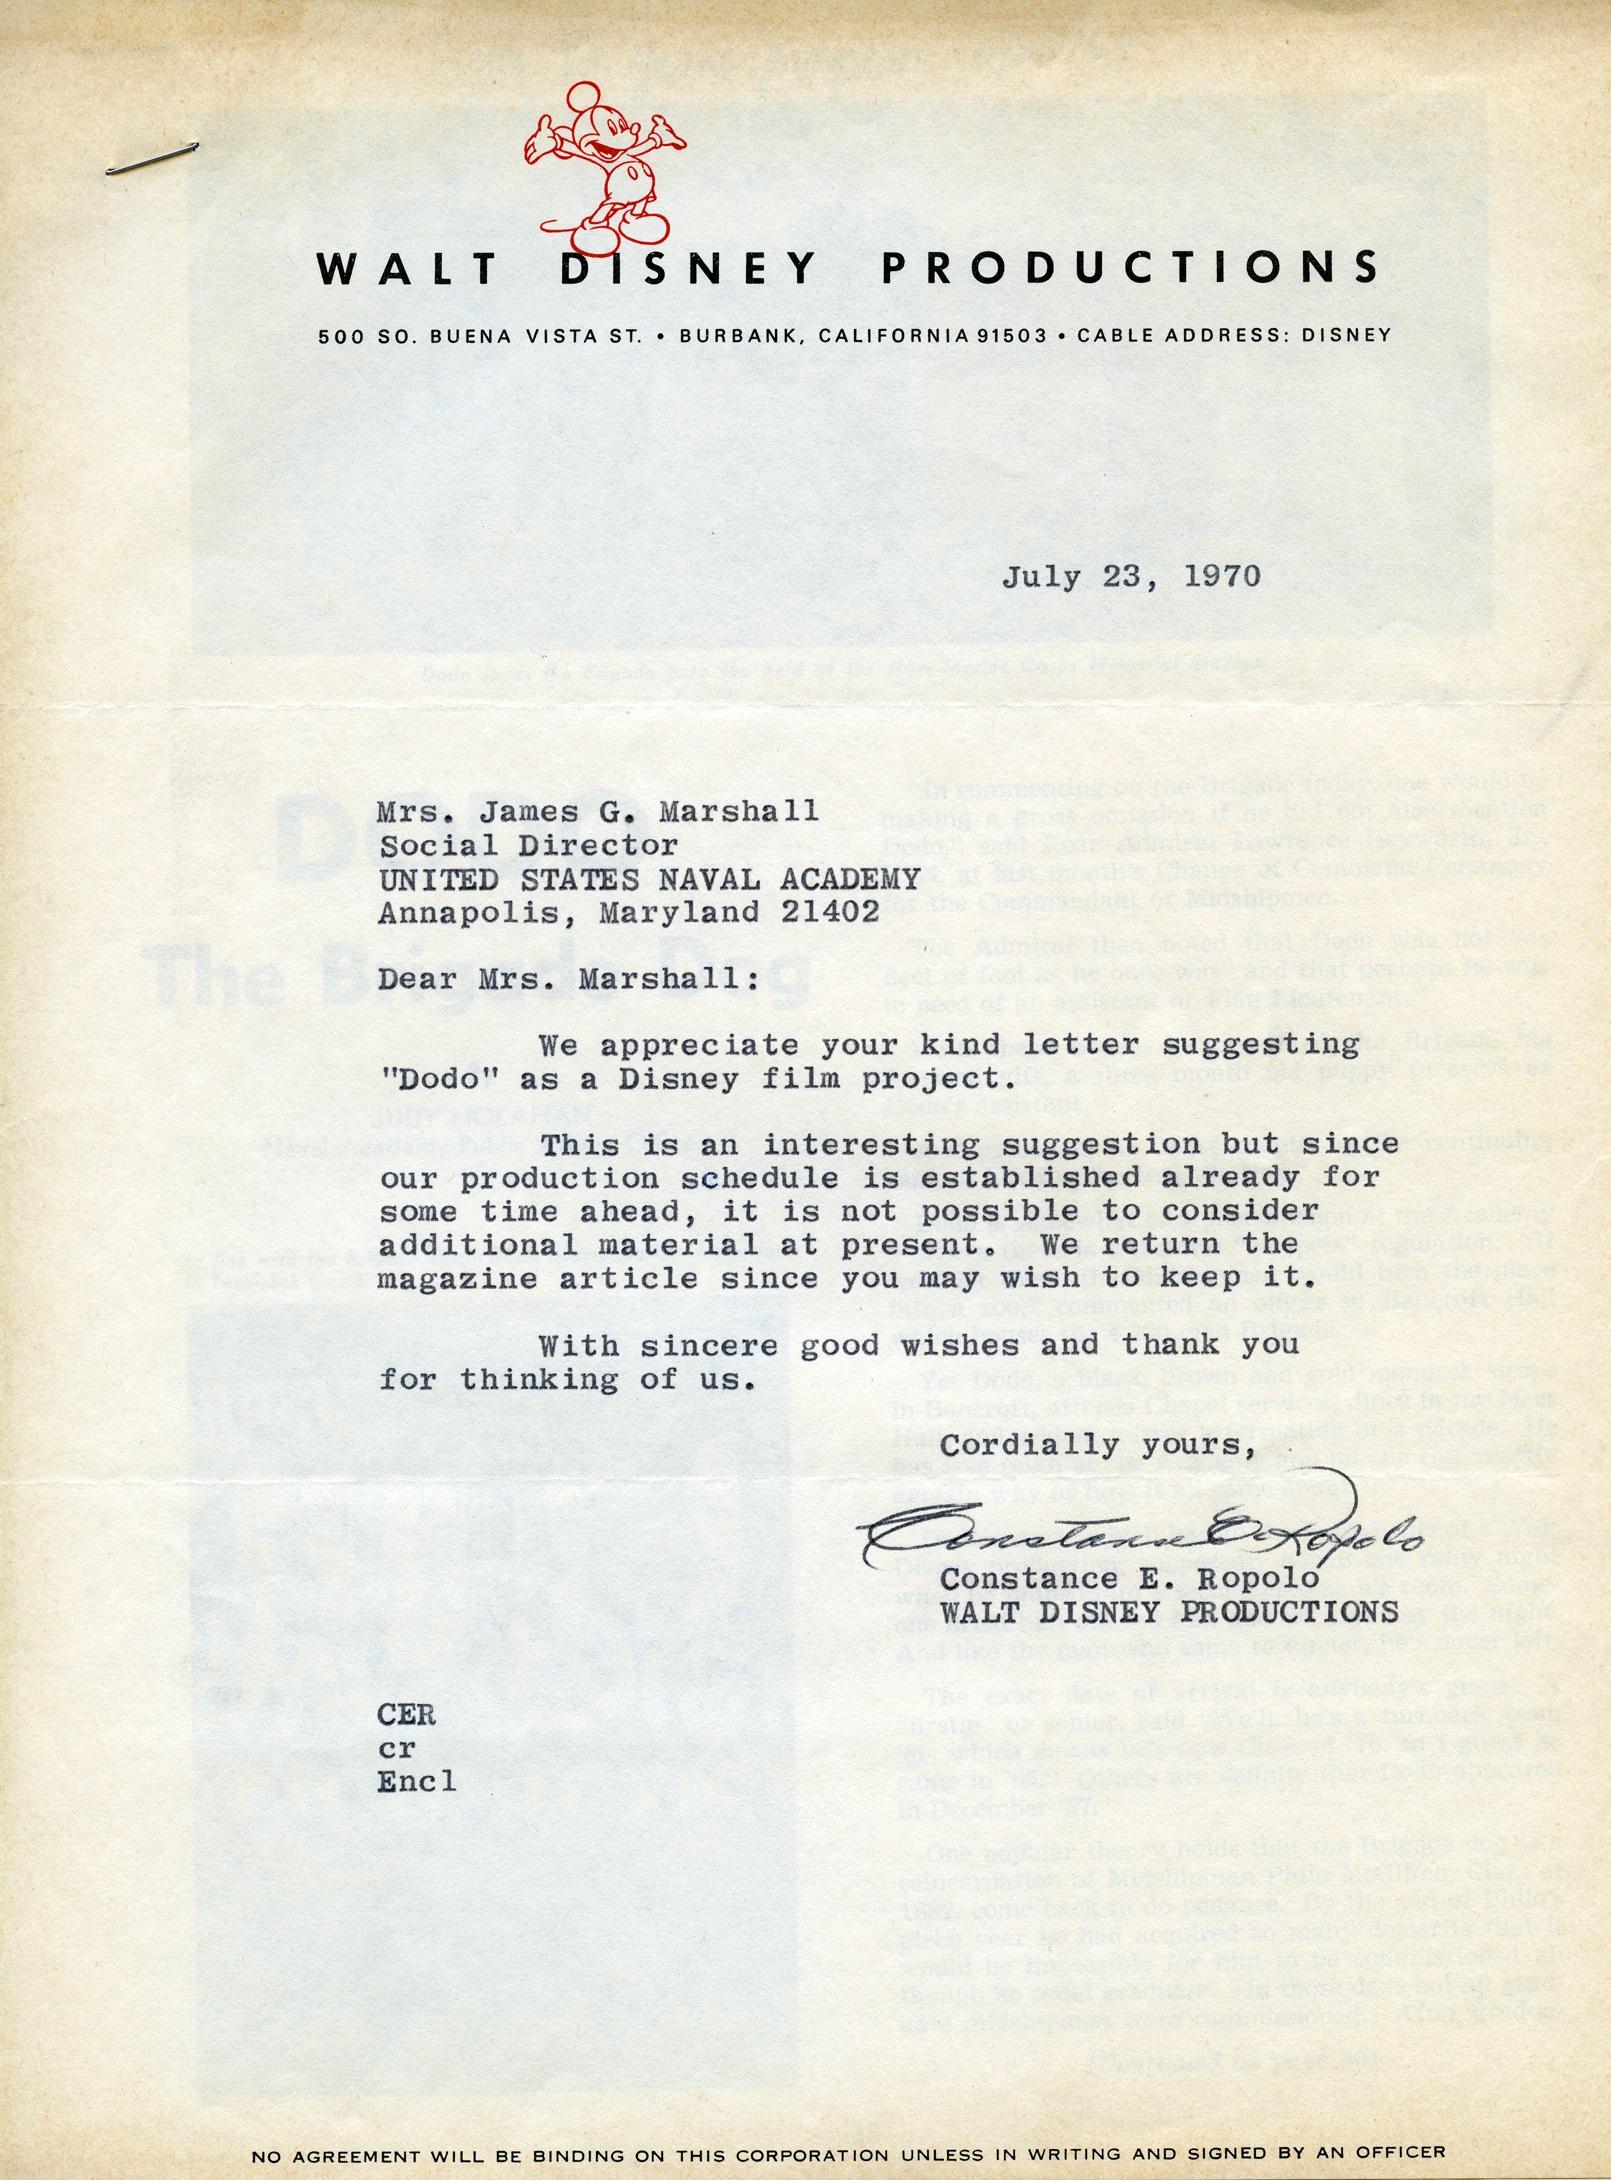 Disney Productions letter